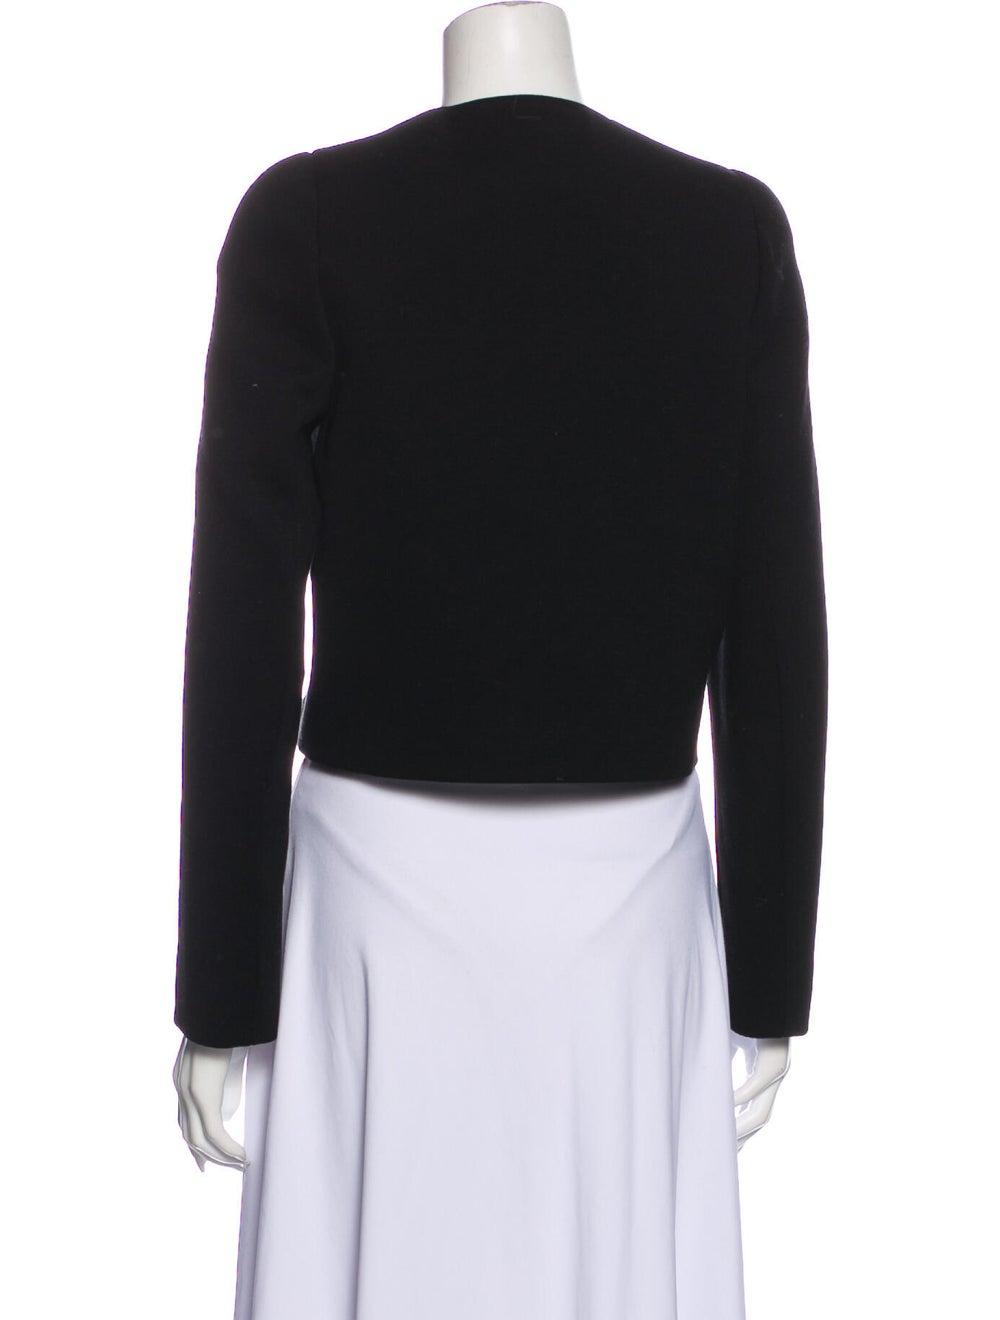 Balenciaga Evening Jacket Black - image 3